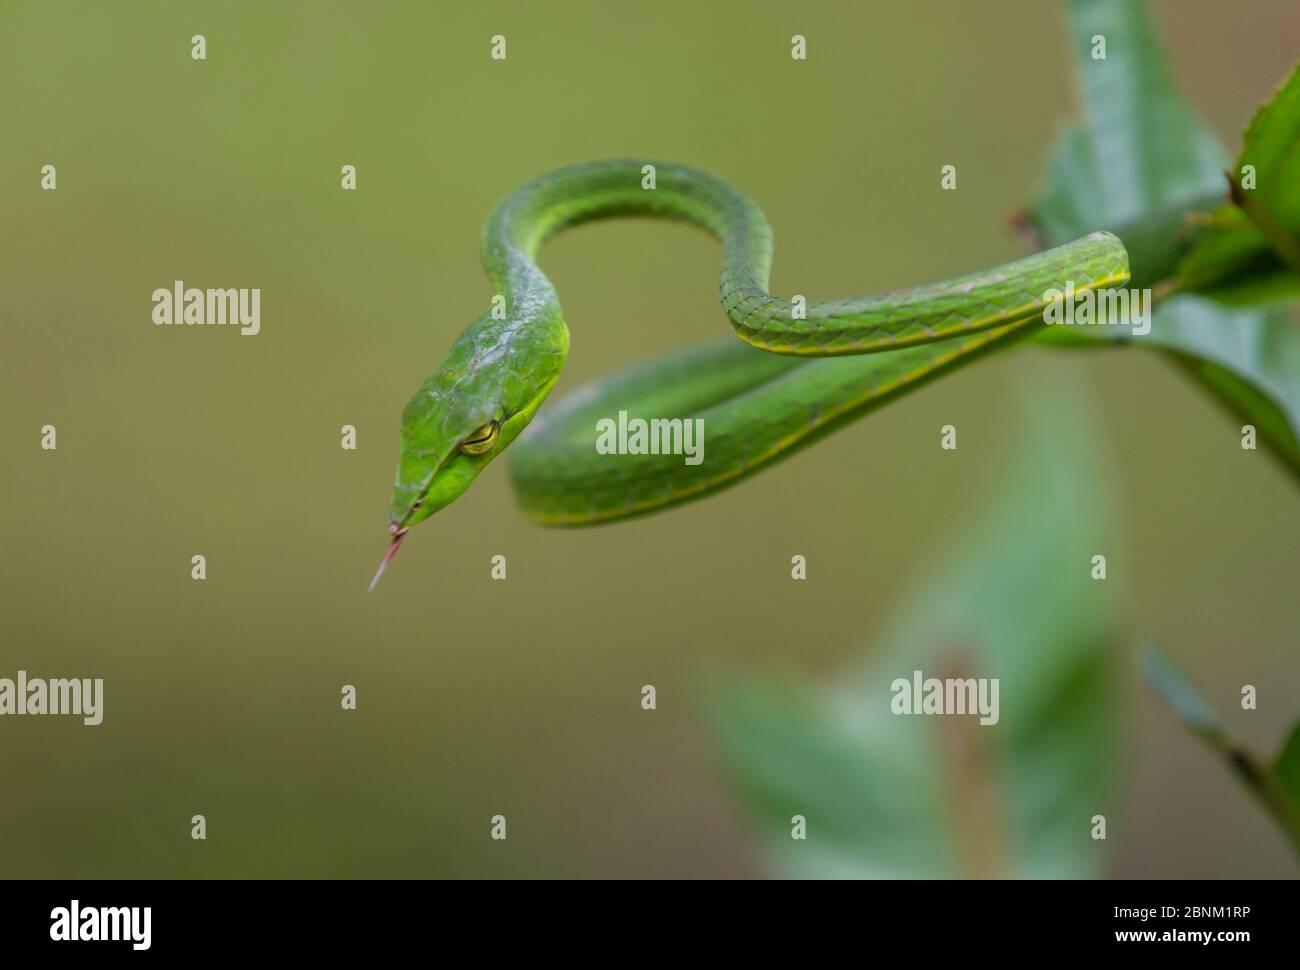 Green vine snake (Aheatulla nasuta), Agumbe, Karnataka, India. Stock Photo